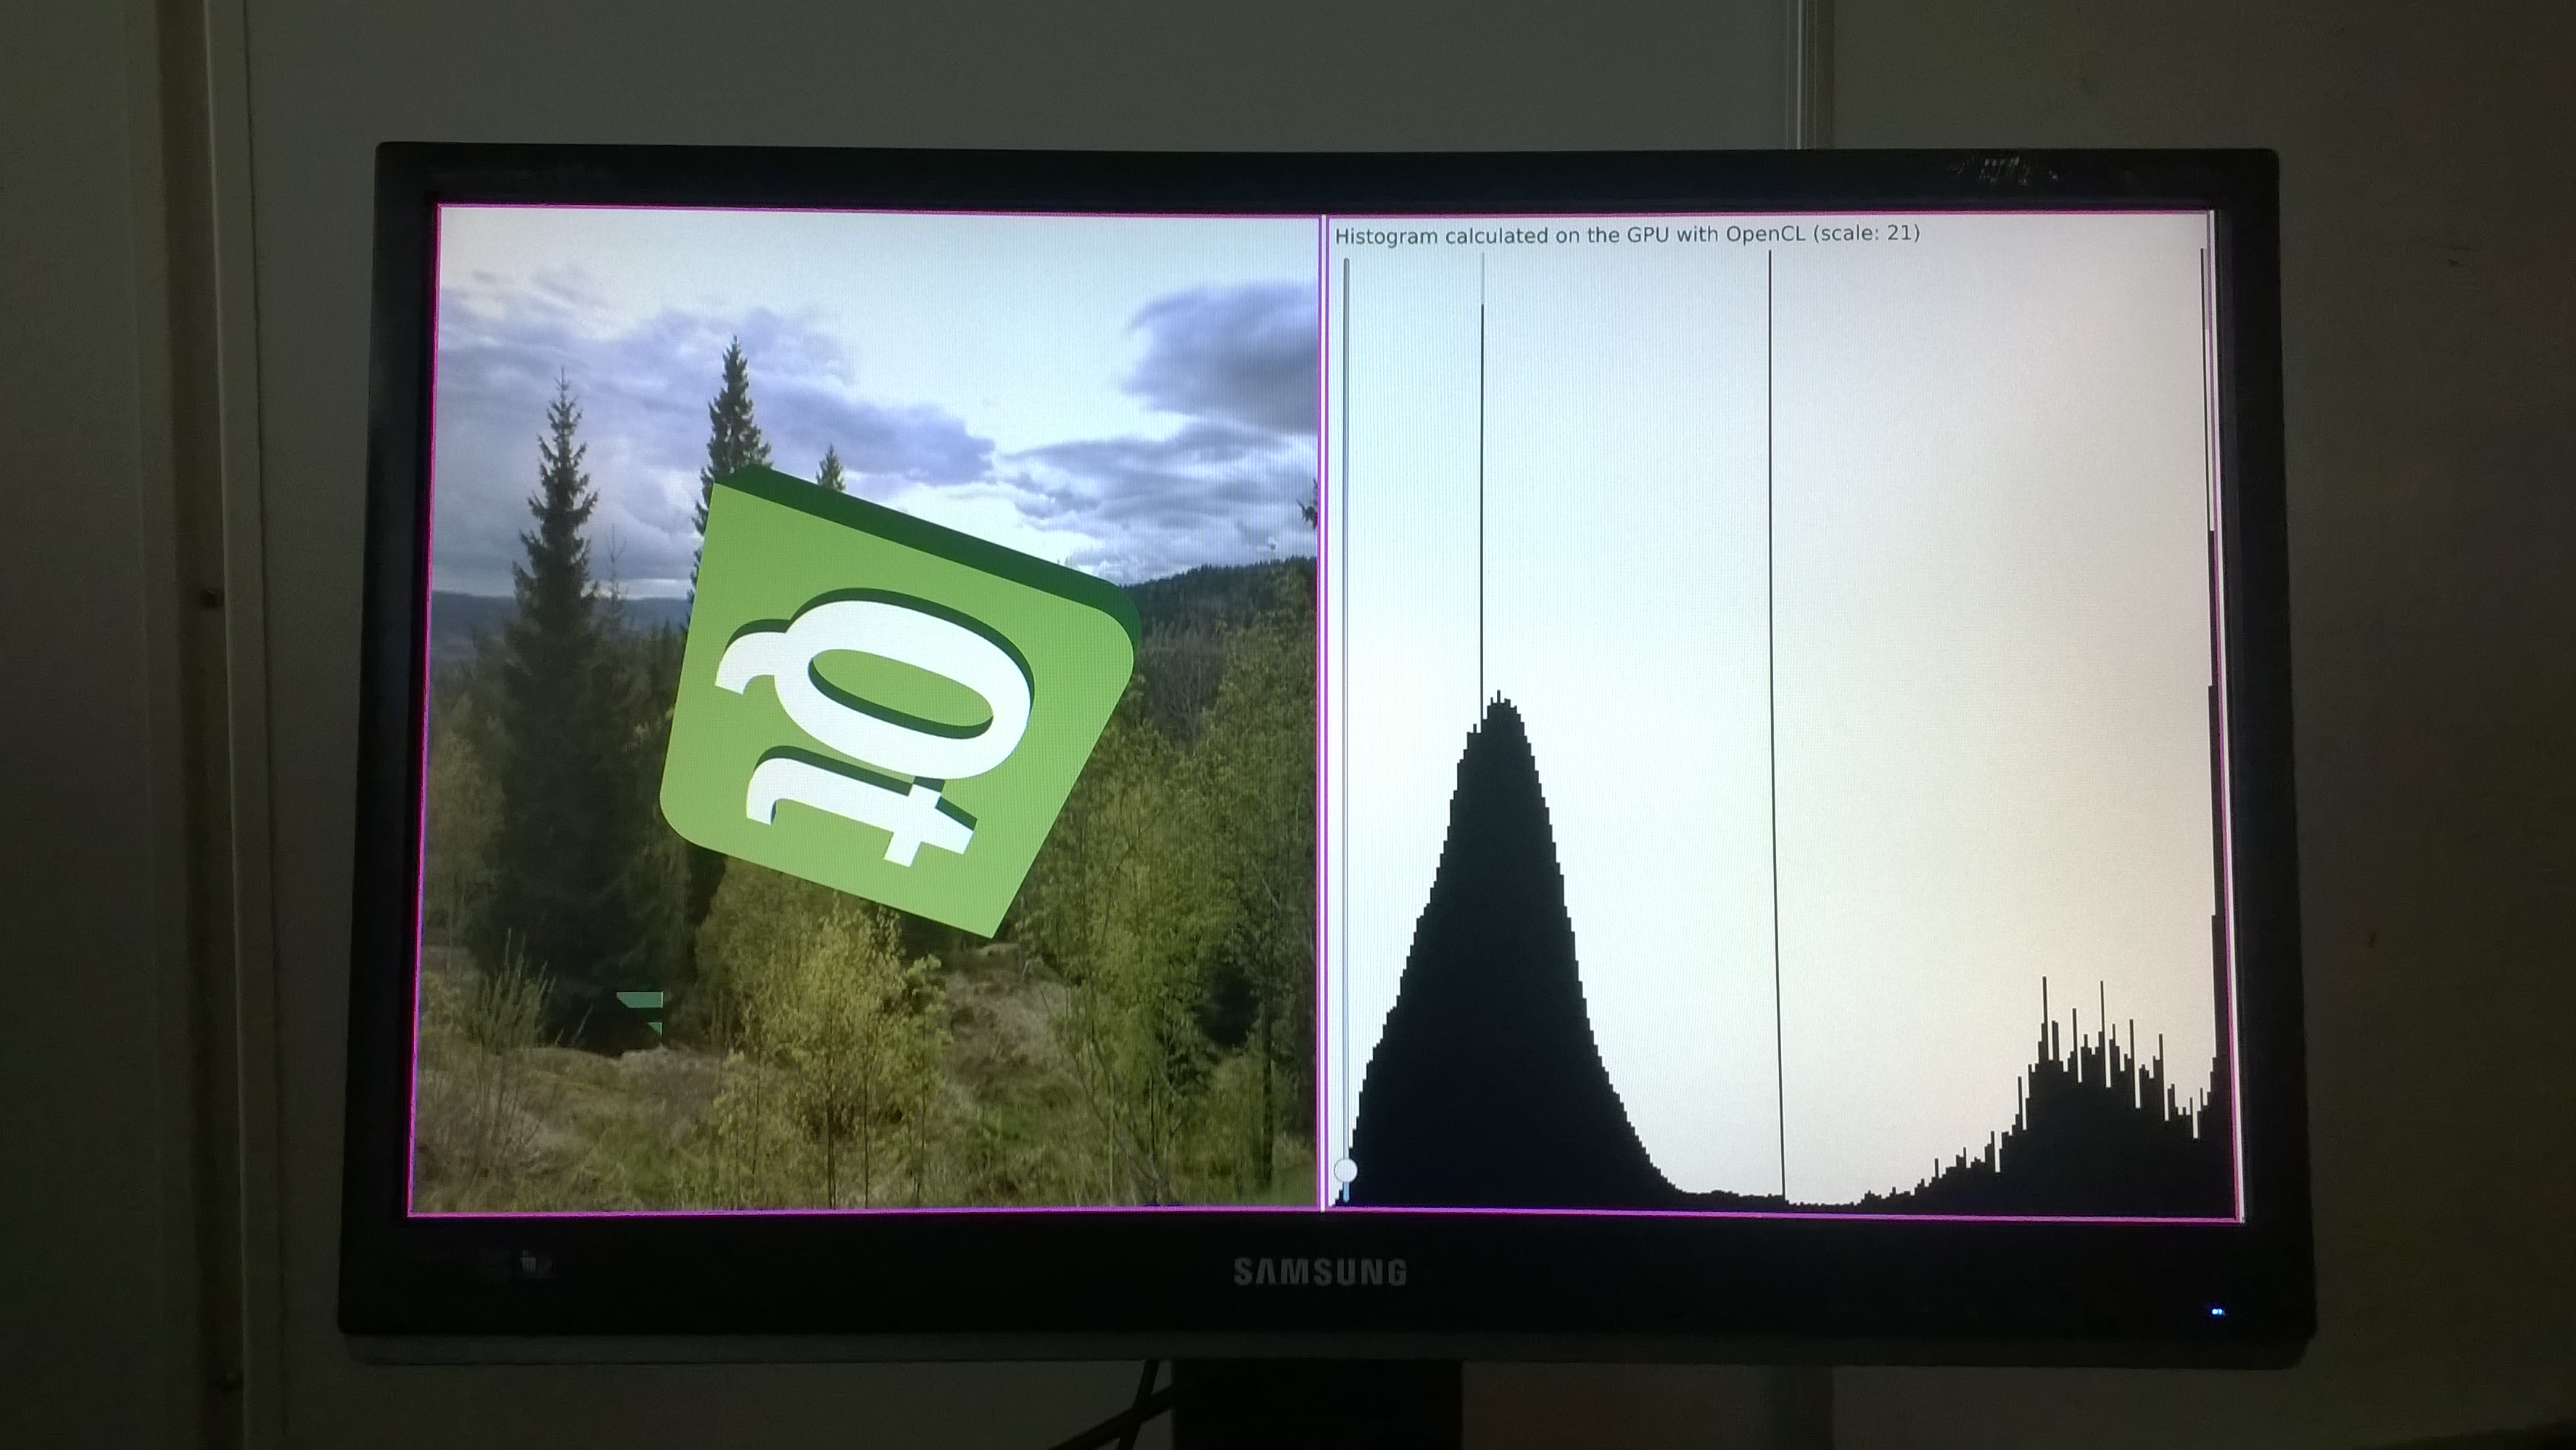 CL-GL histogram